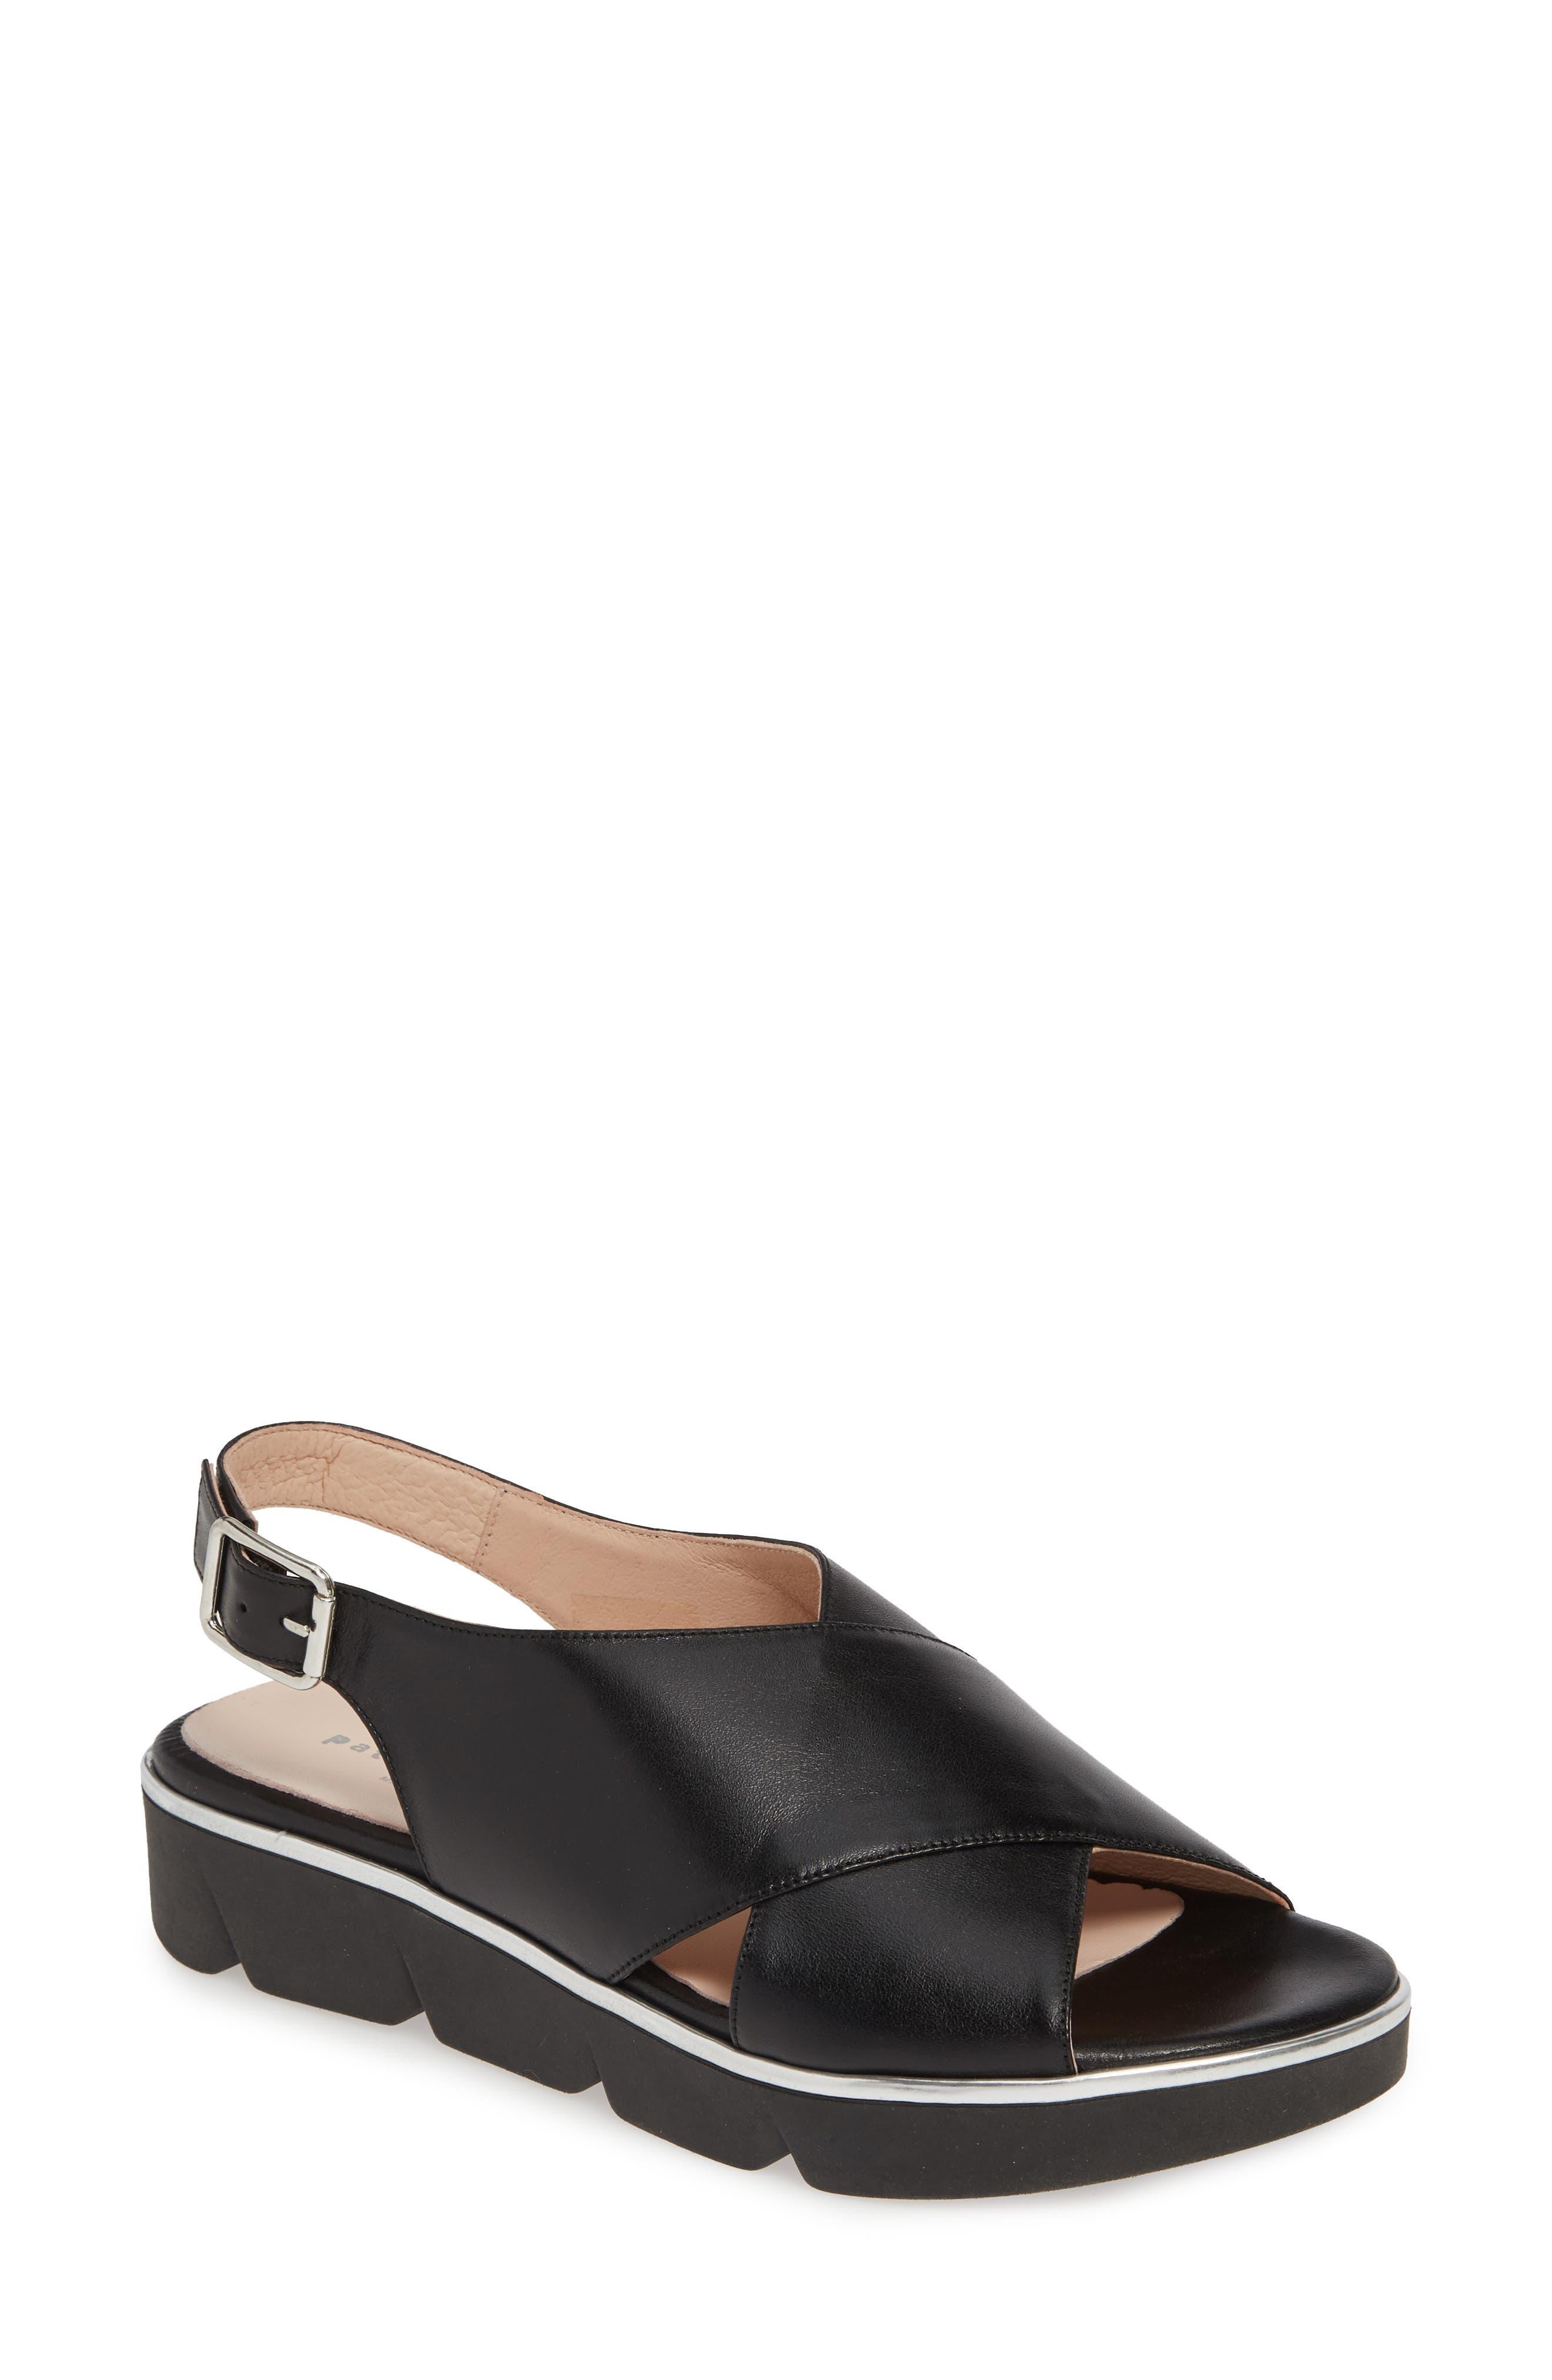 Patricia Green Candace Slingback Wedge Sandal, Black